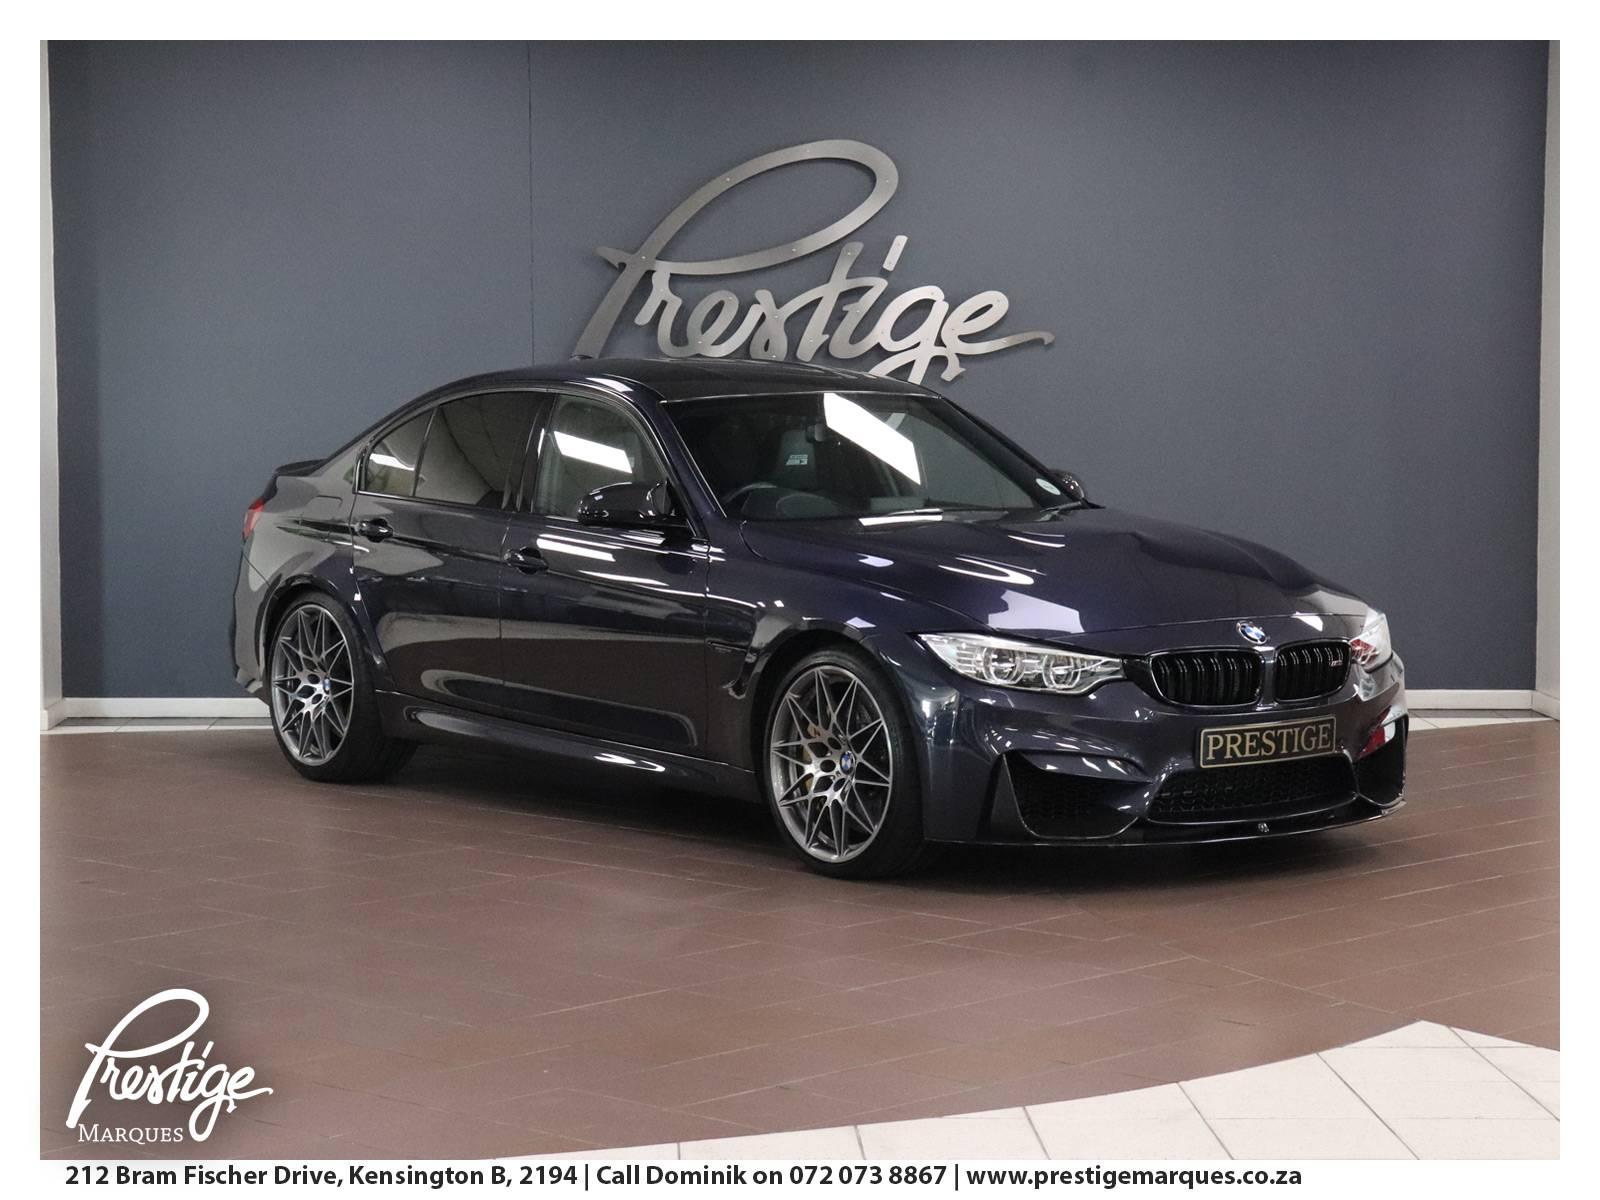 2016-BMW-M3-MDCT-30-Jarare-Prestige-Marques-Randburg-Sandton-1